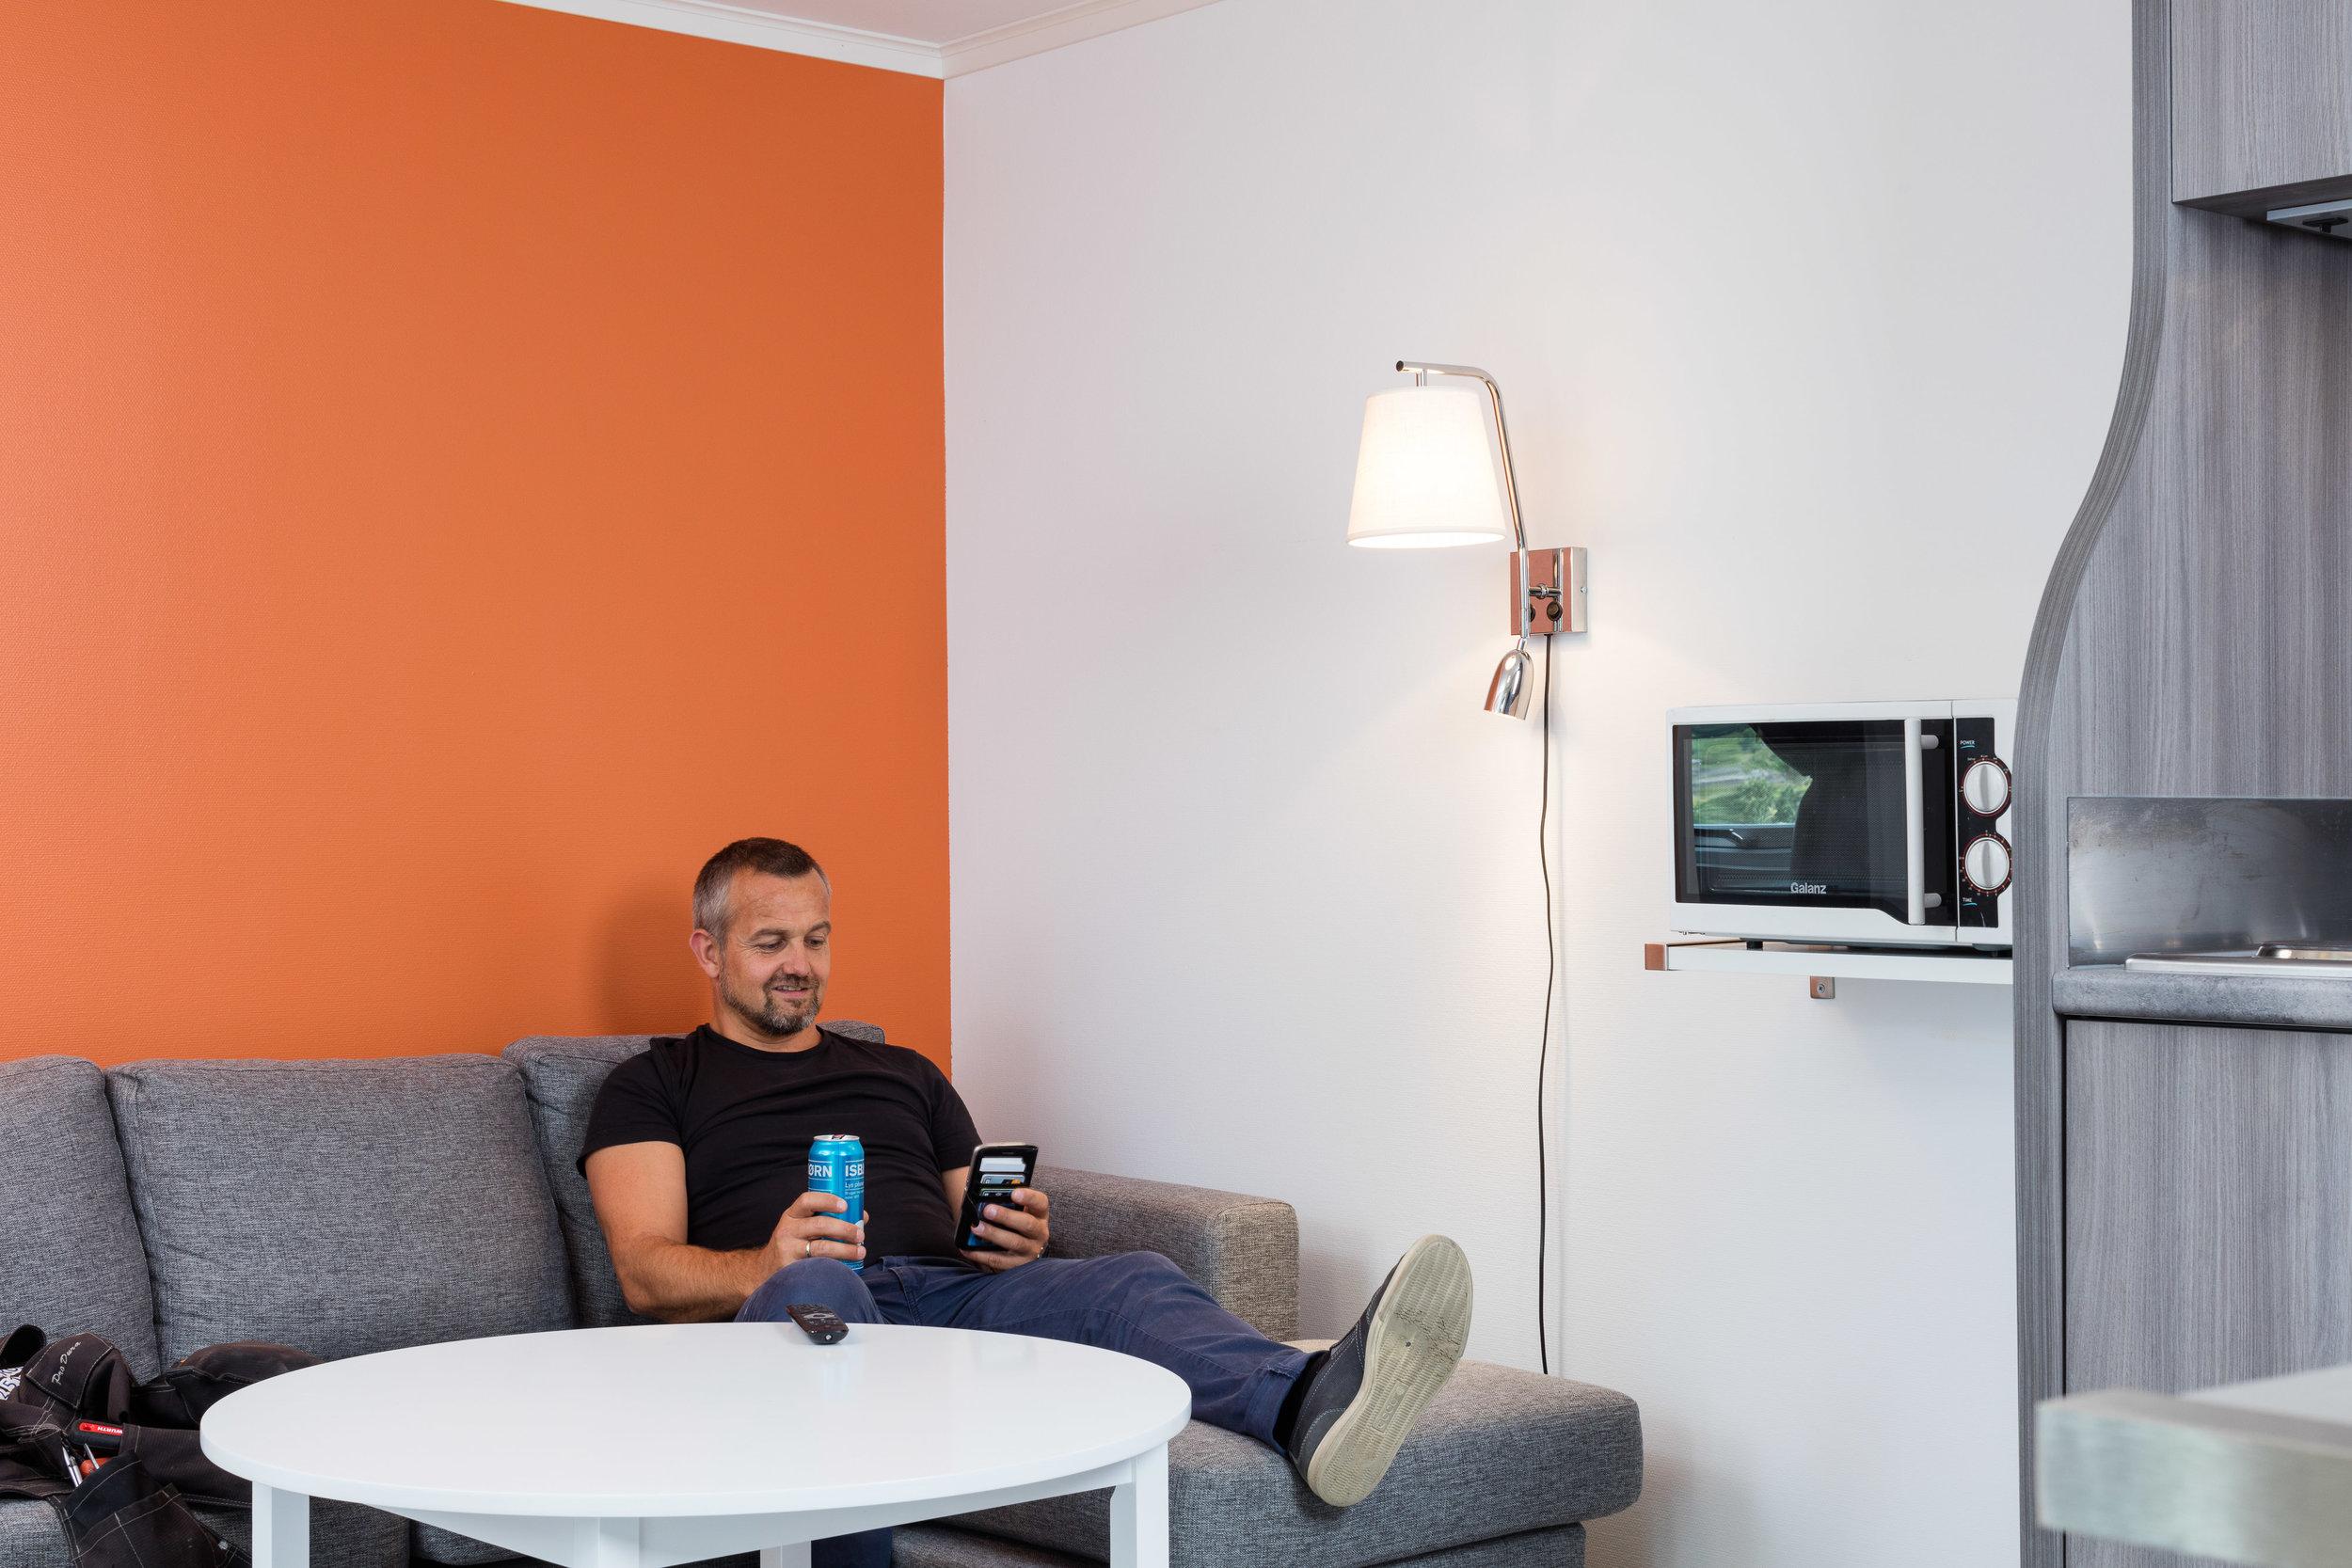 Dolmsundet-hotell-hitra-norge-fotoknoff-sven-erik-knoff-8502.jpg